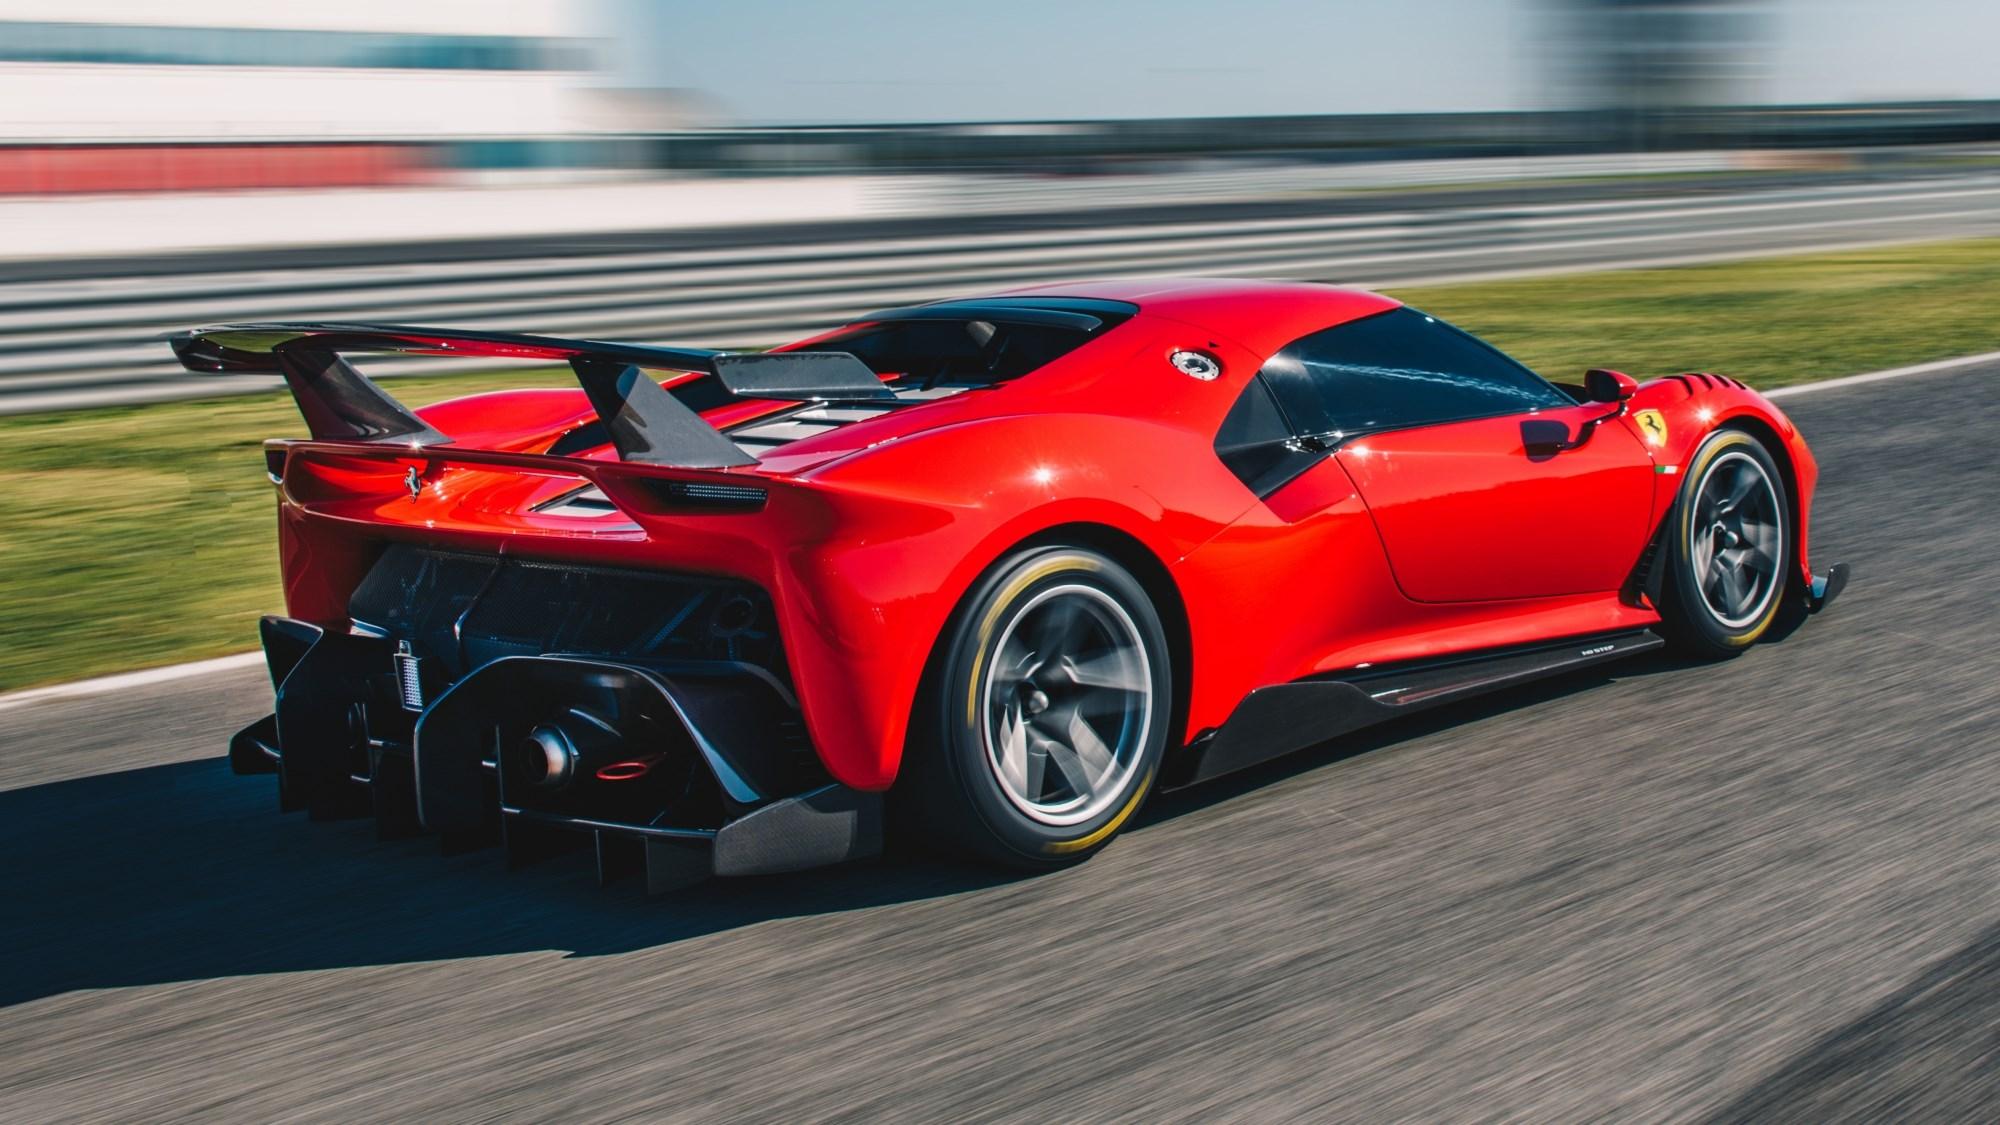 Ferrari's P80/C Is A One-Off Track Machine Of Dreams Thumbnail